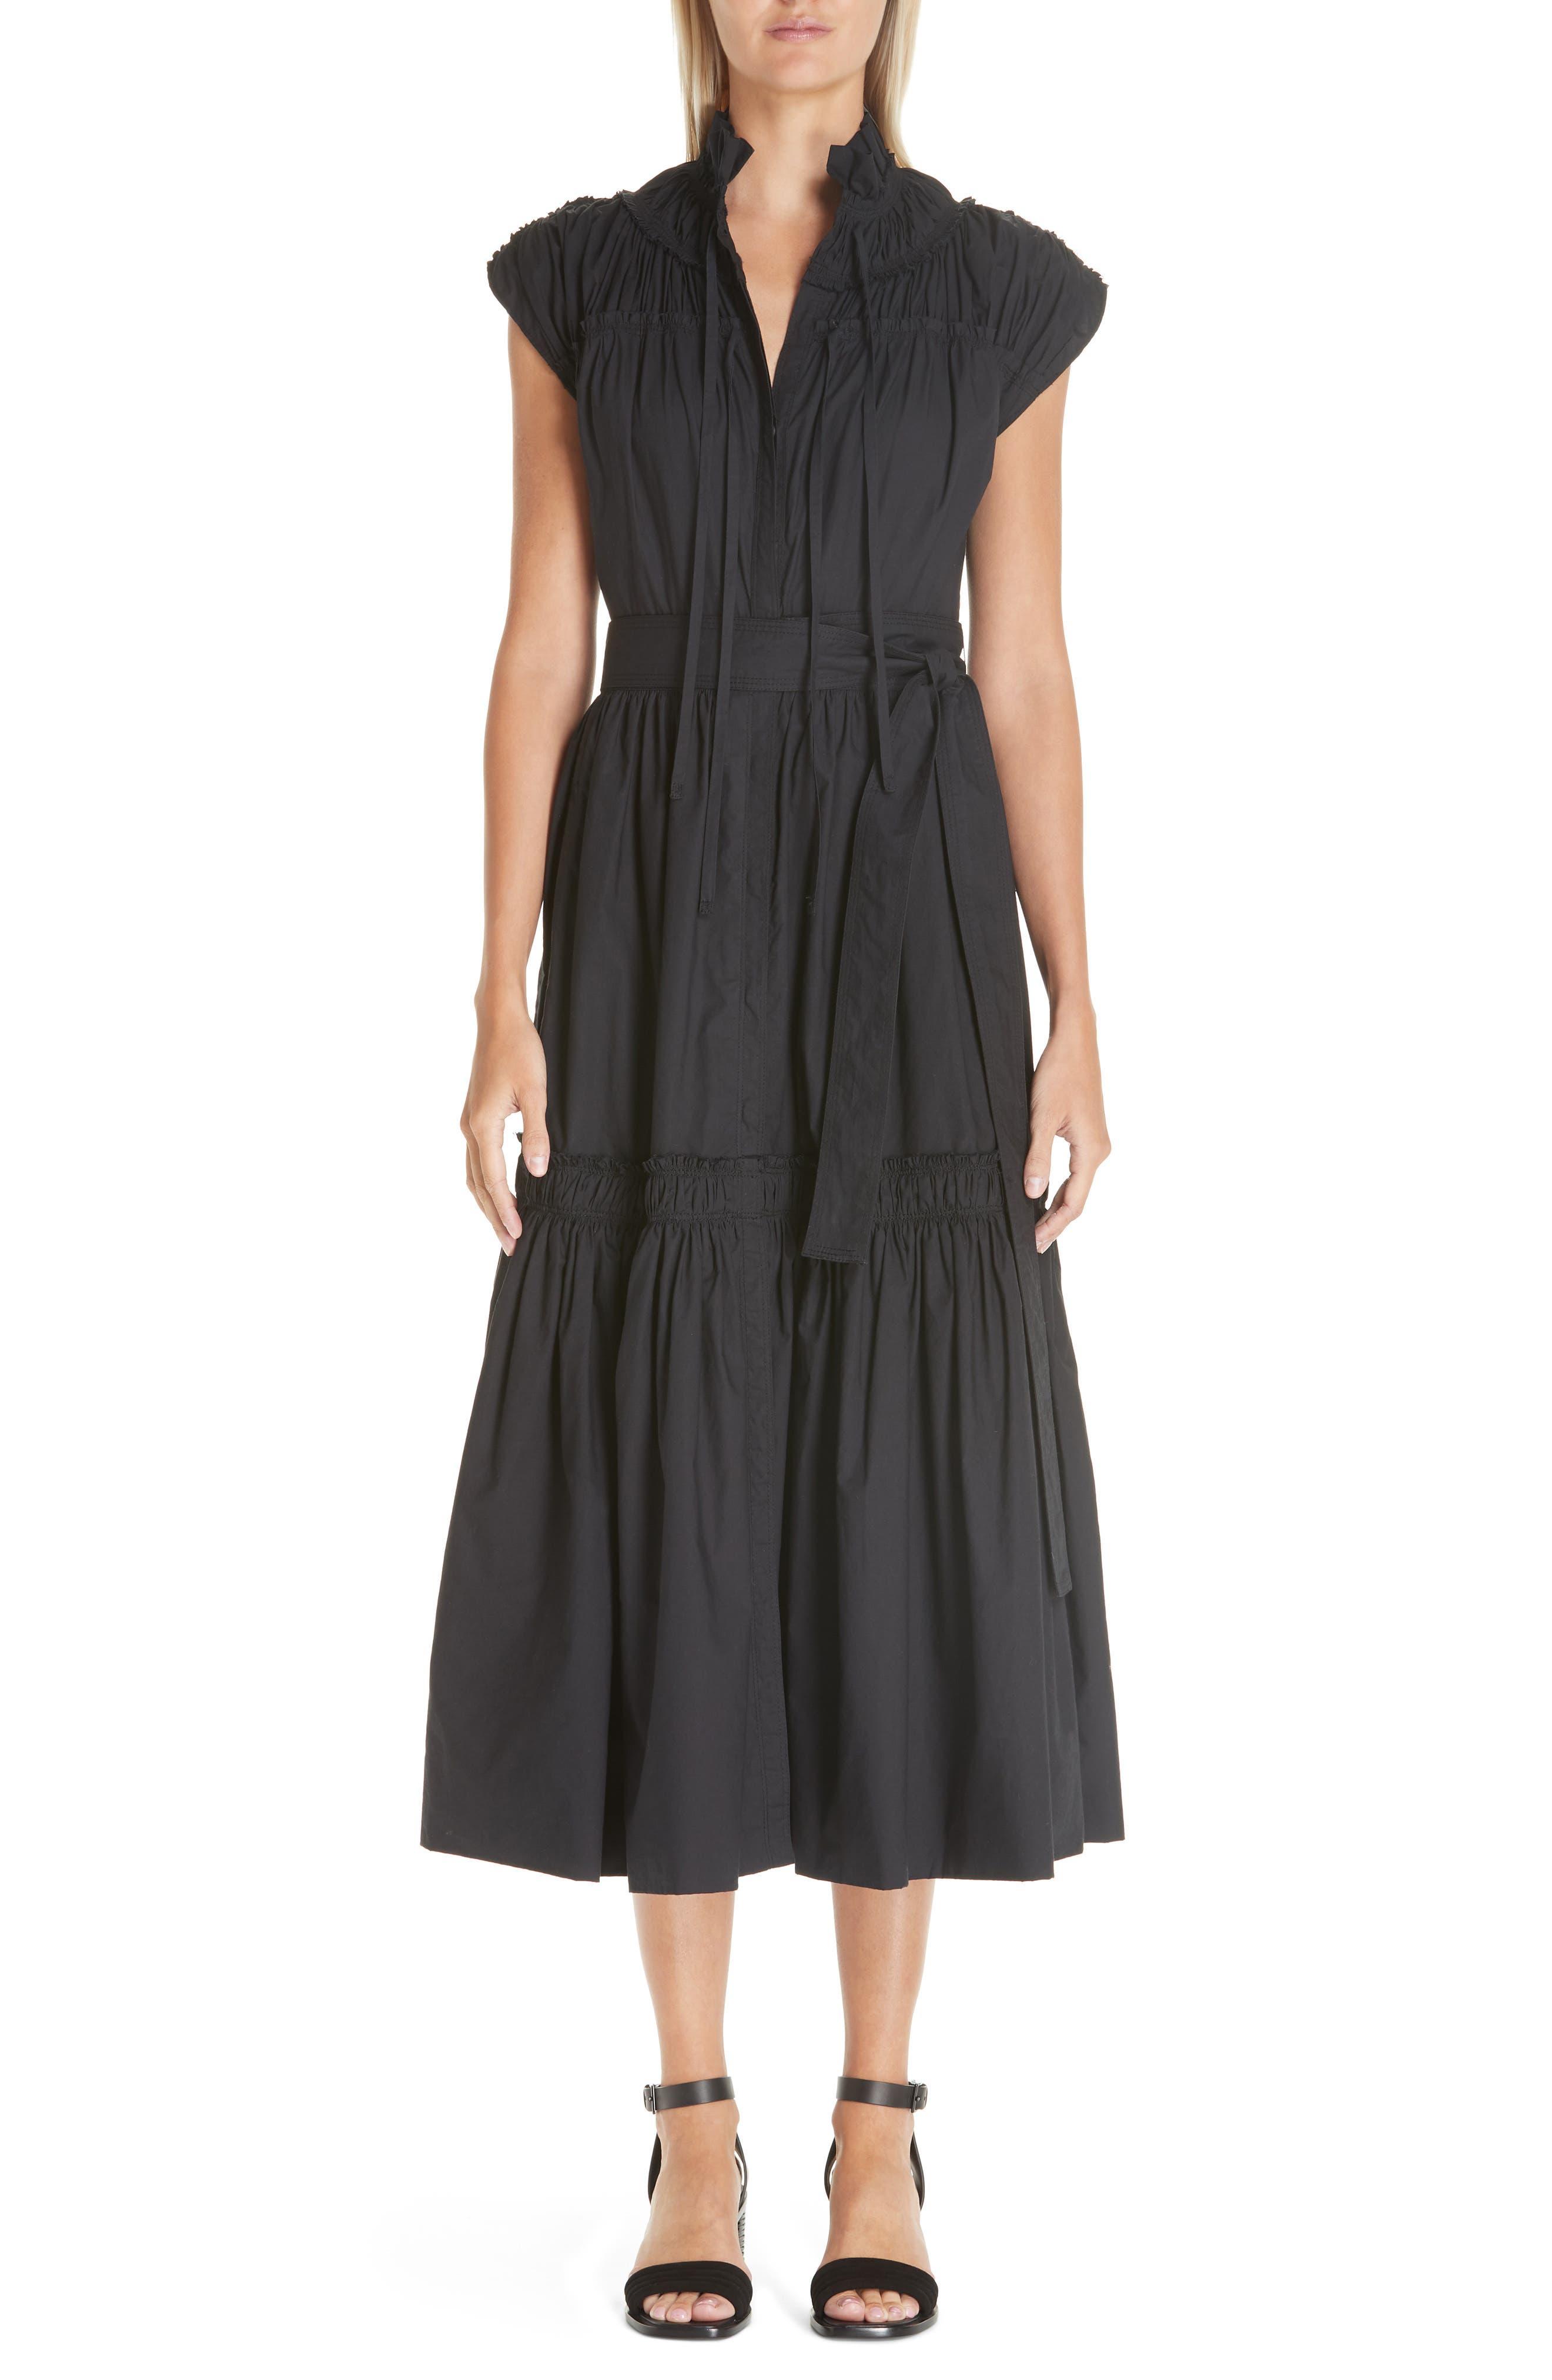 PROENZA SCHOULER, Smocked Poplin Dress, Main thumbnail 1, color, BLACK